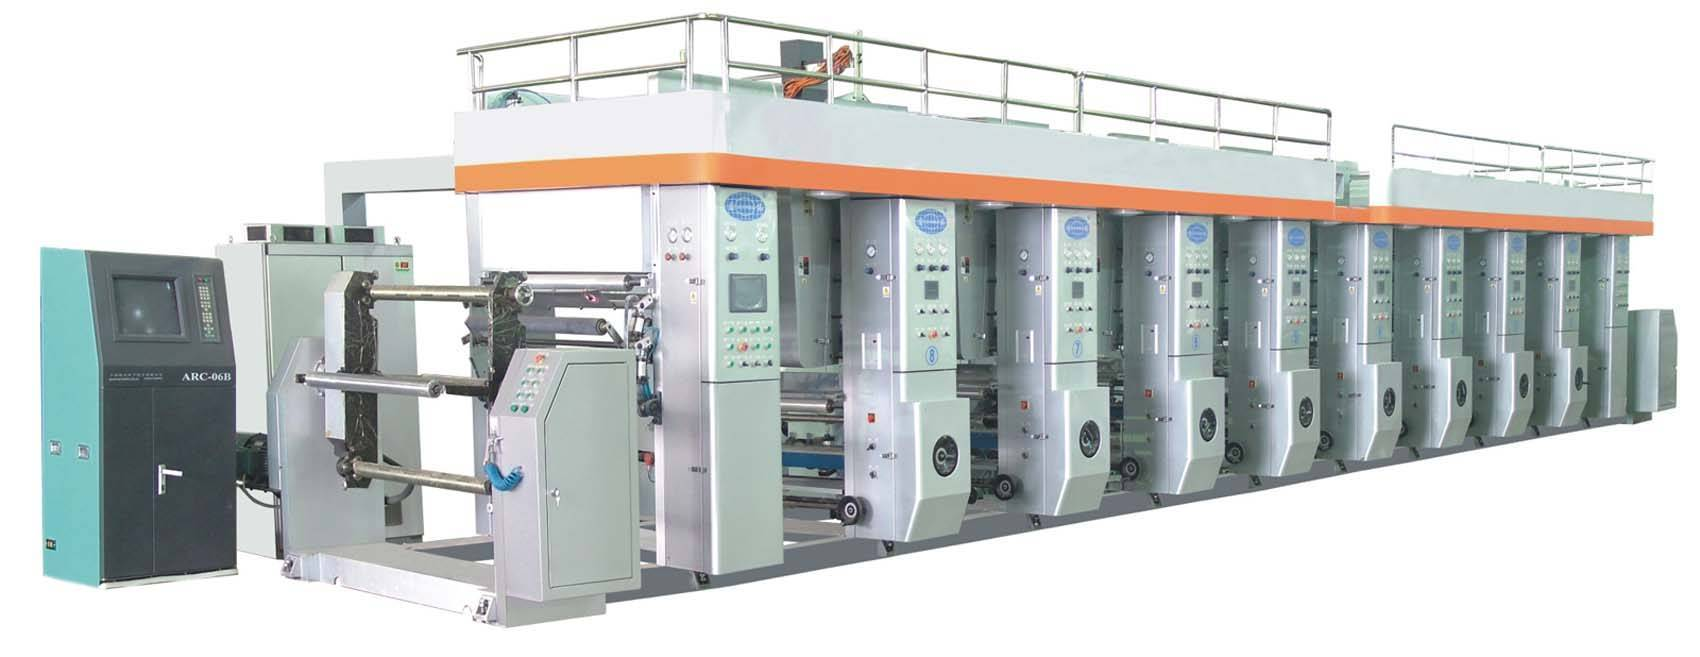 High Speed Gravure Printing Machine HPRT600-1200A